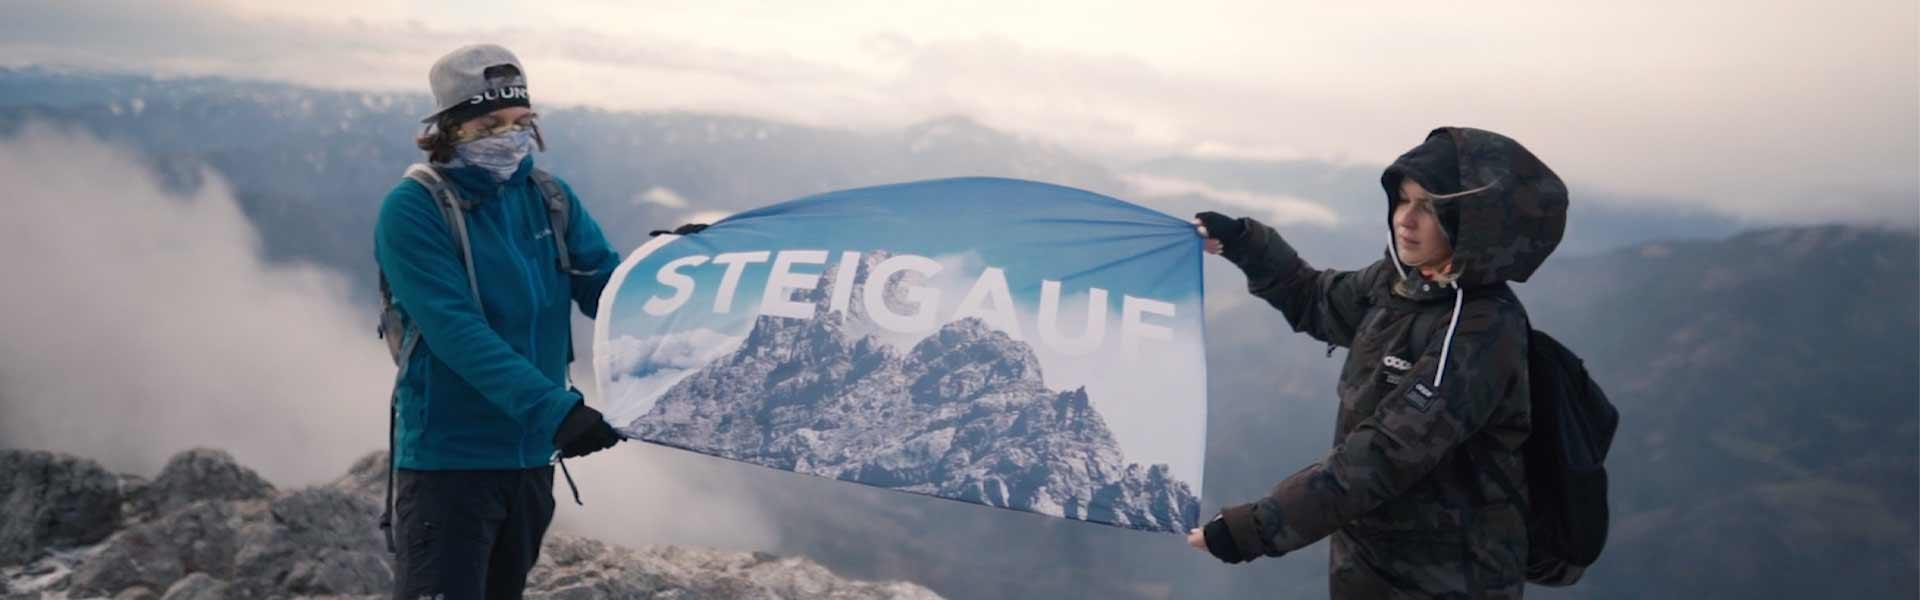 Bergsteiger Video